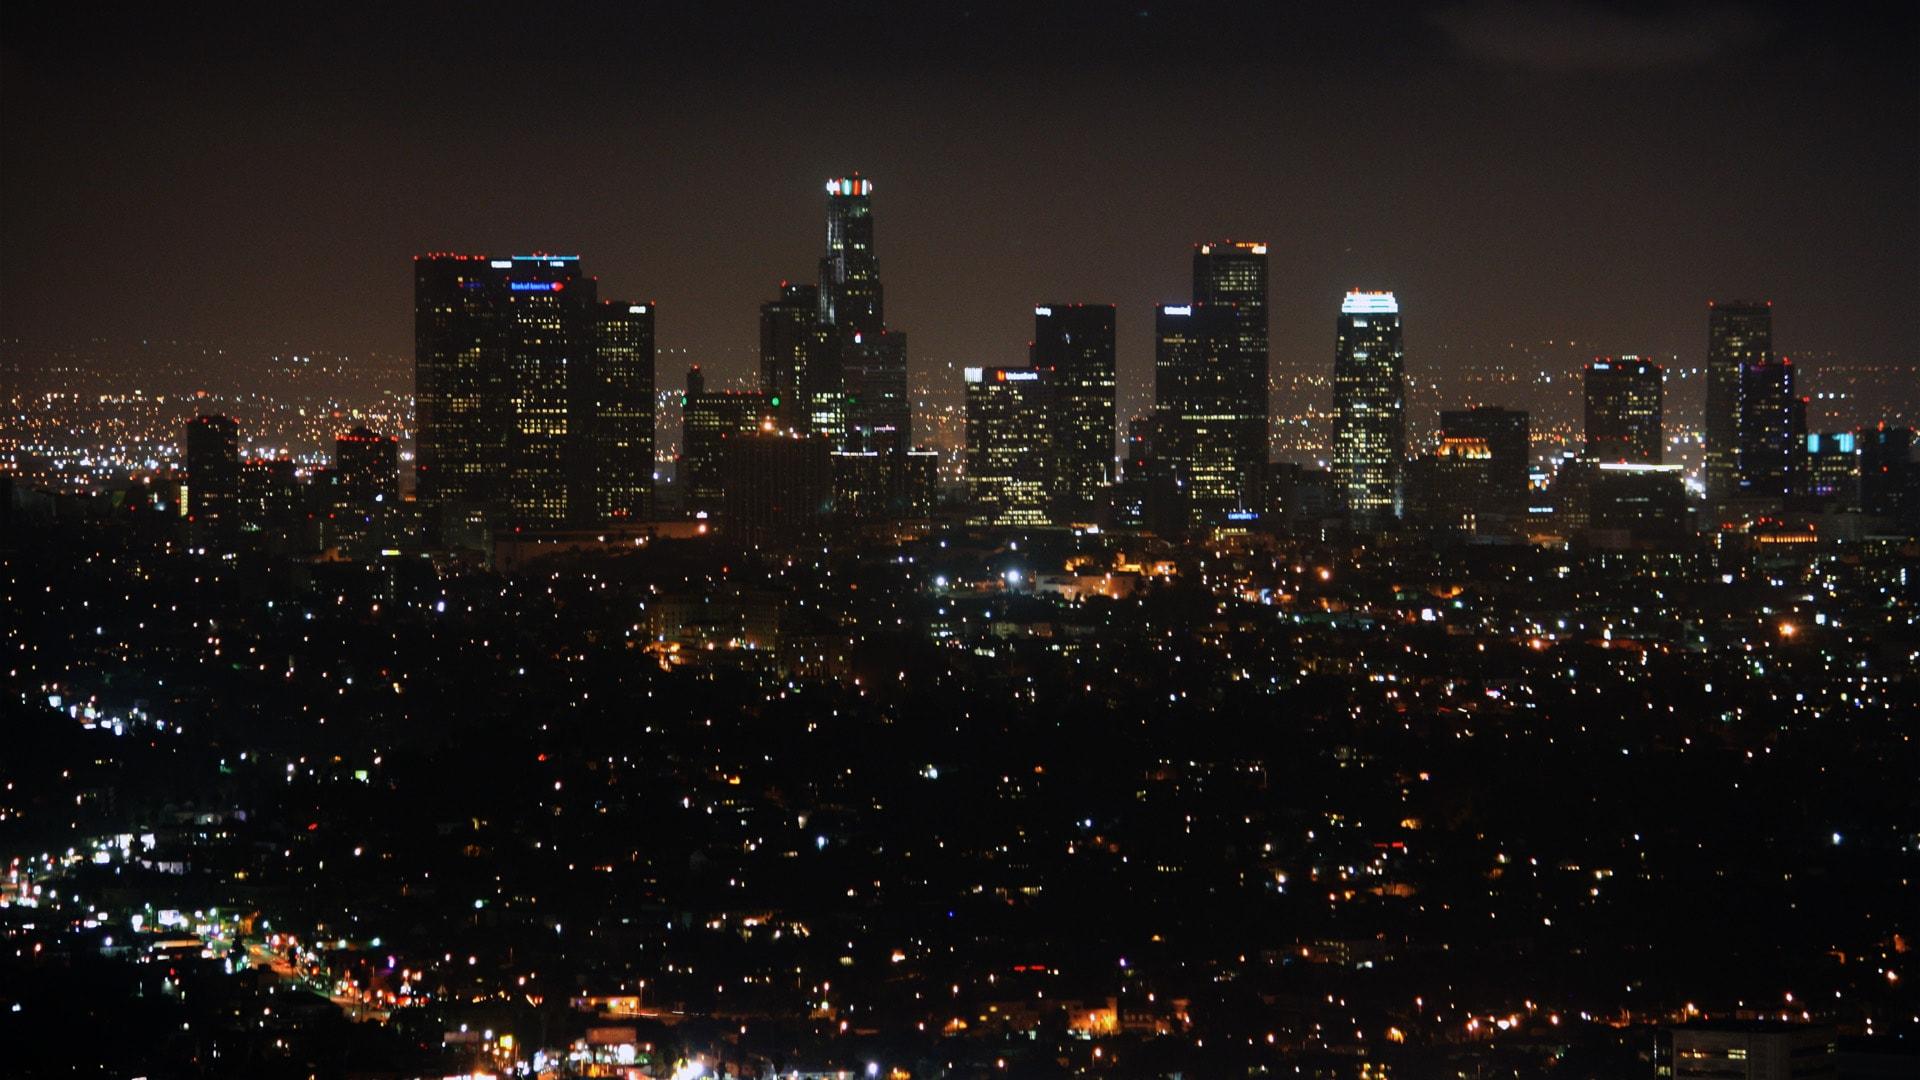 Los Angeles widescreen for desktop